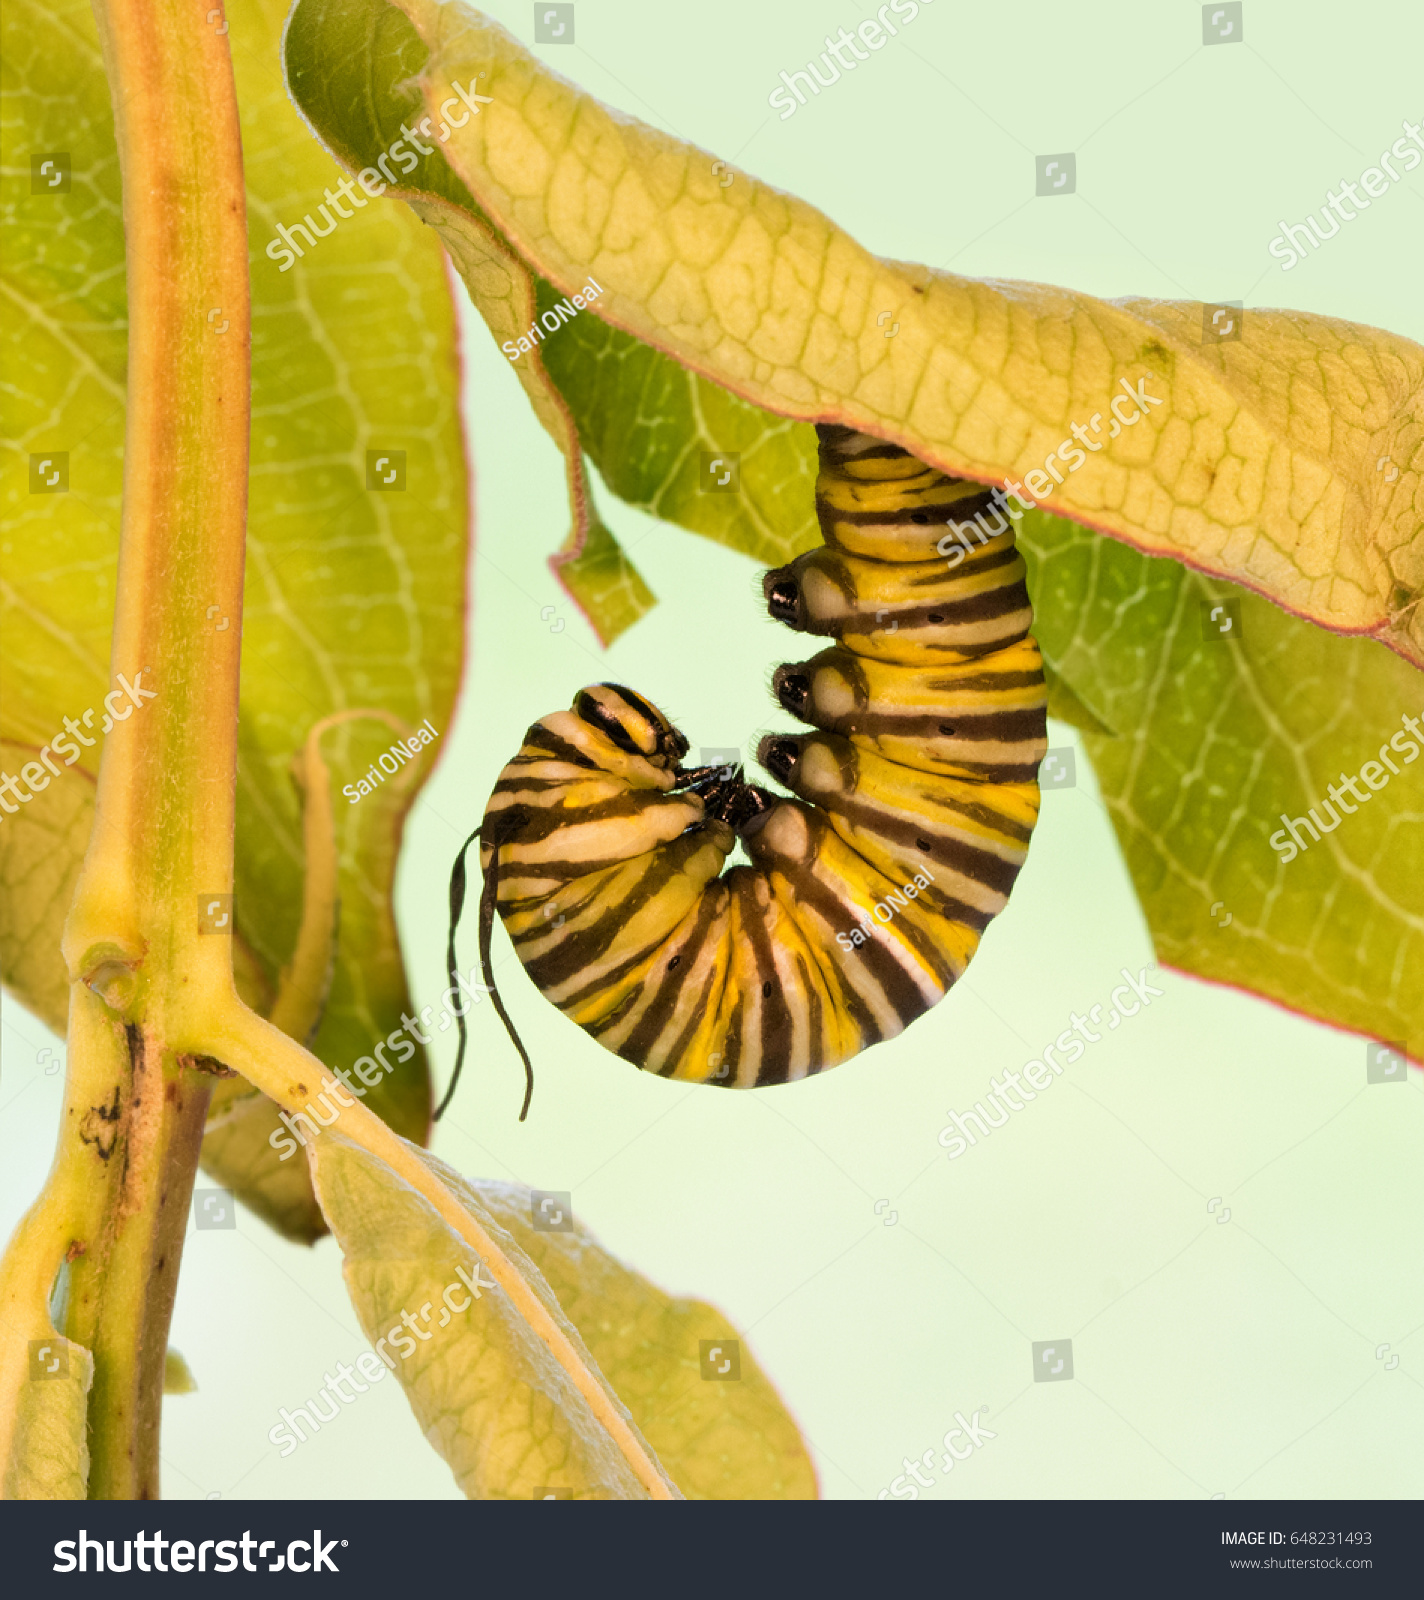 stock-photo-monarch-caterpillar-hanging-